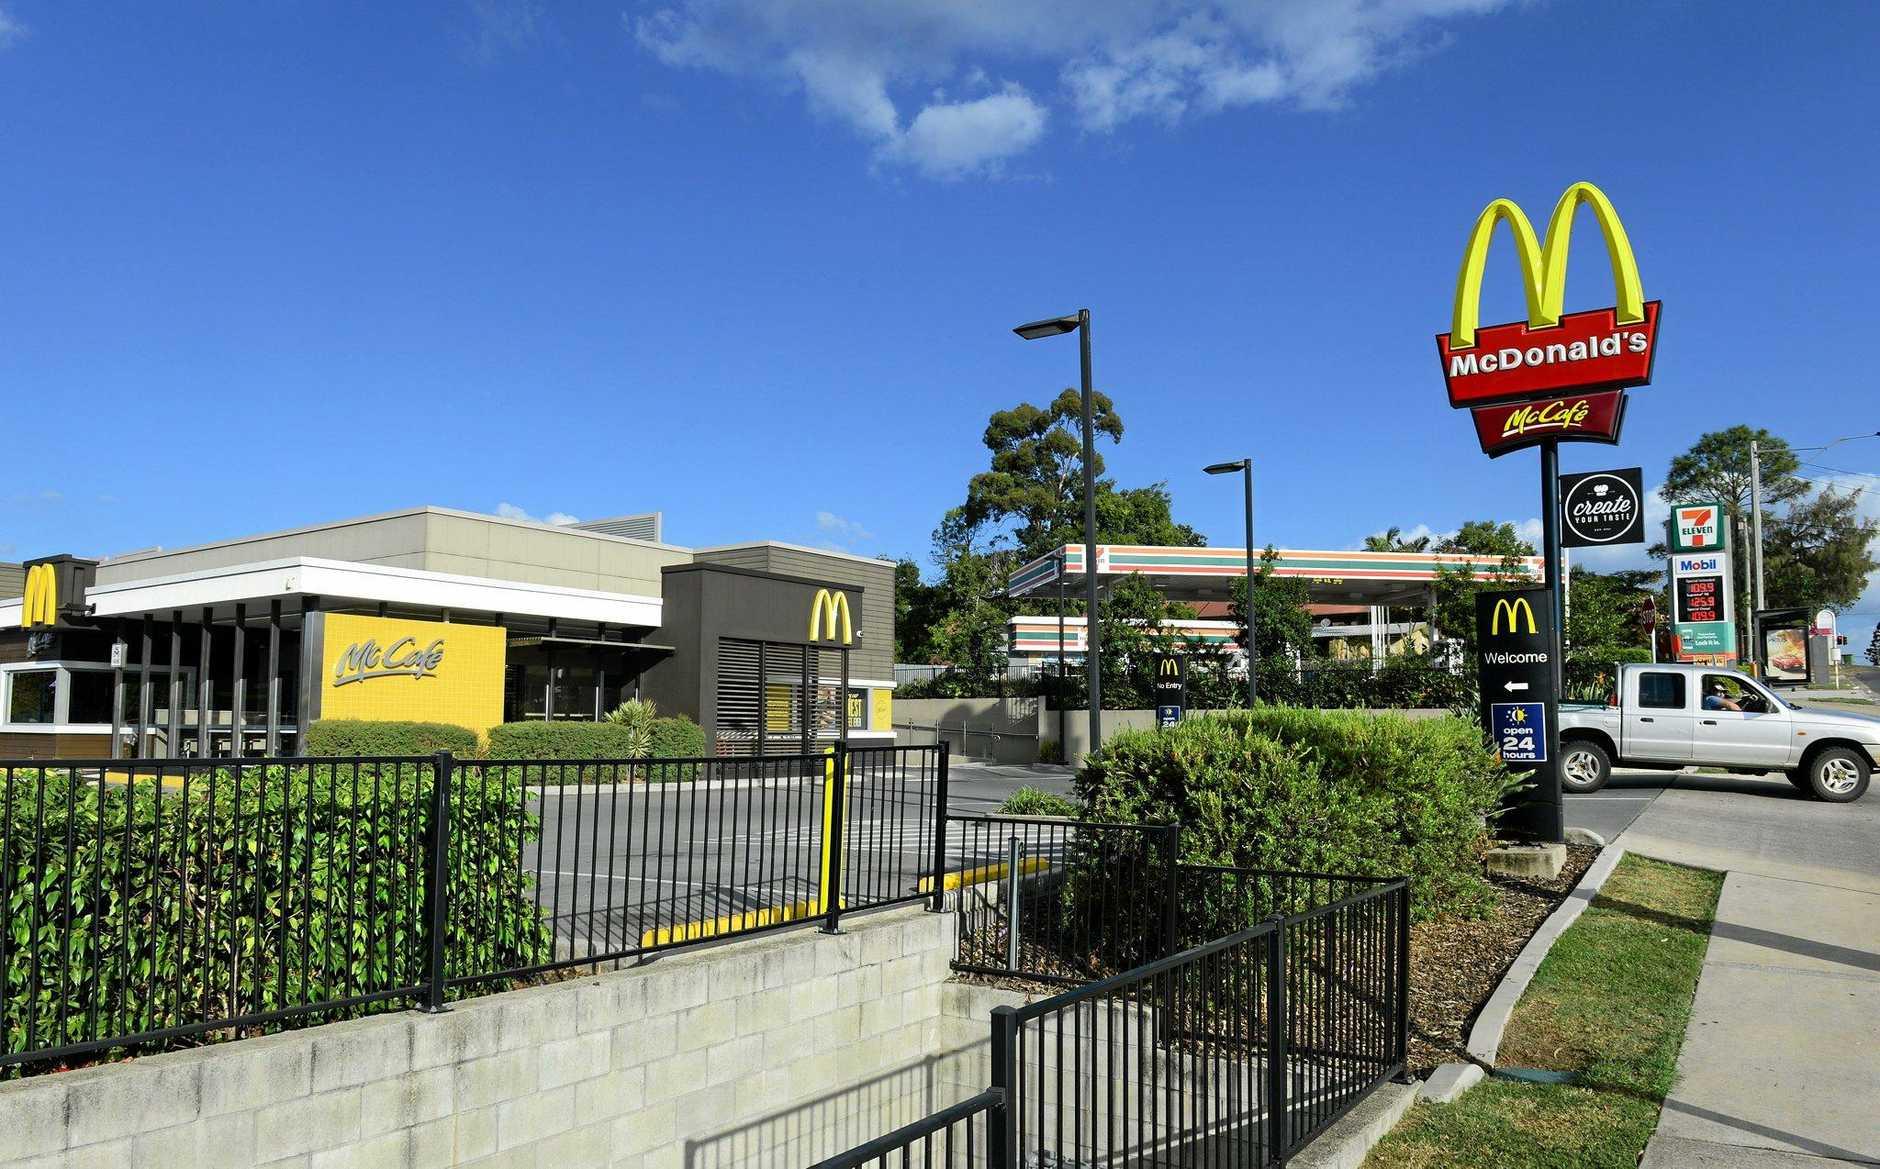 The McDonald's restaurant on Redbank Plains Road, Bellbird Park was the scene of a large disturbance late on Saturday night.